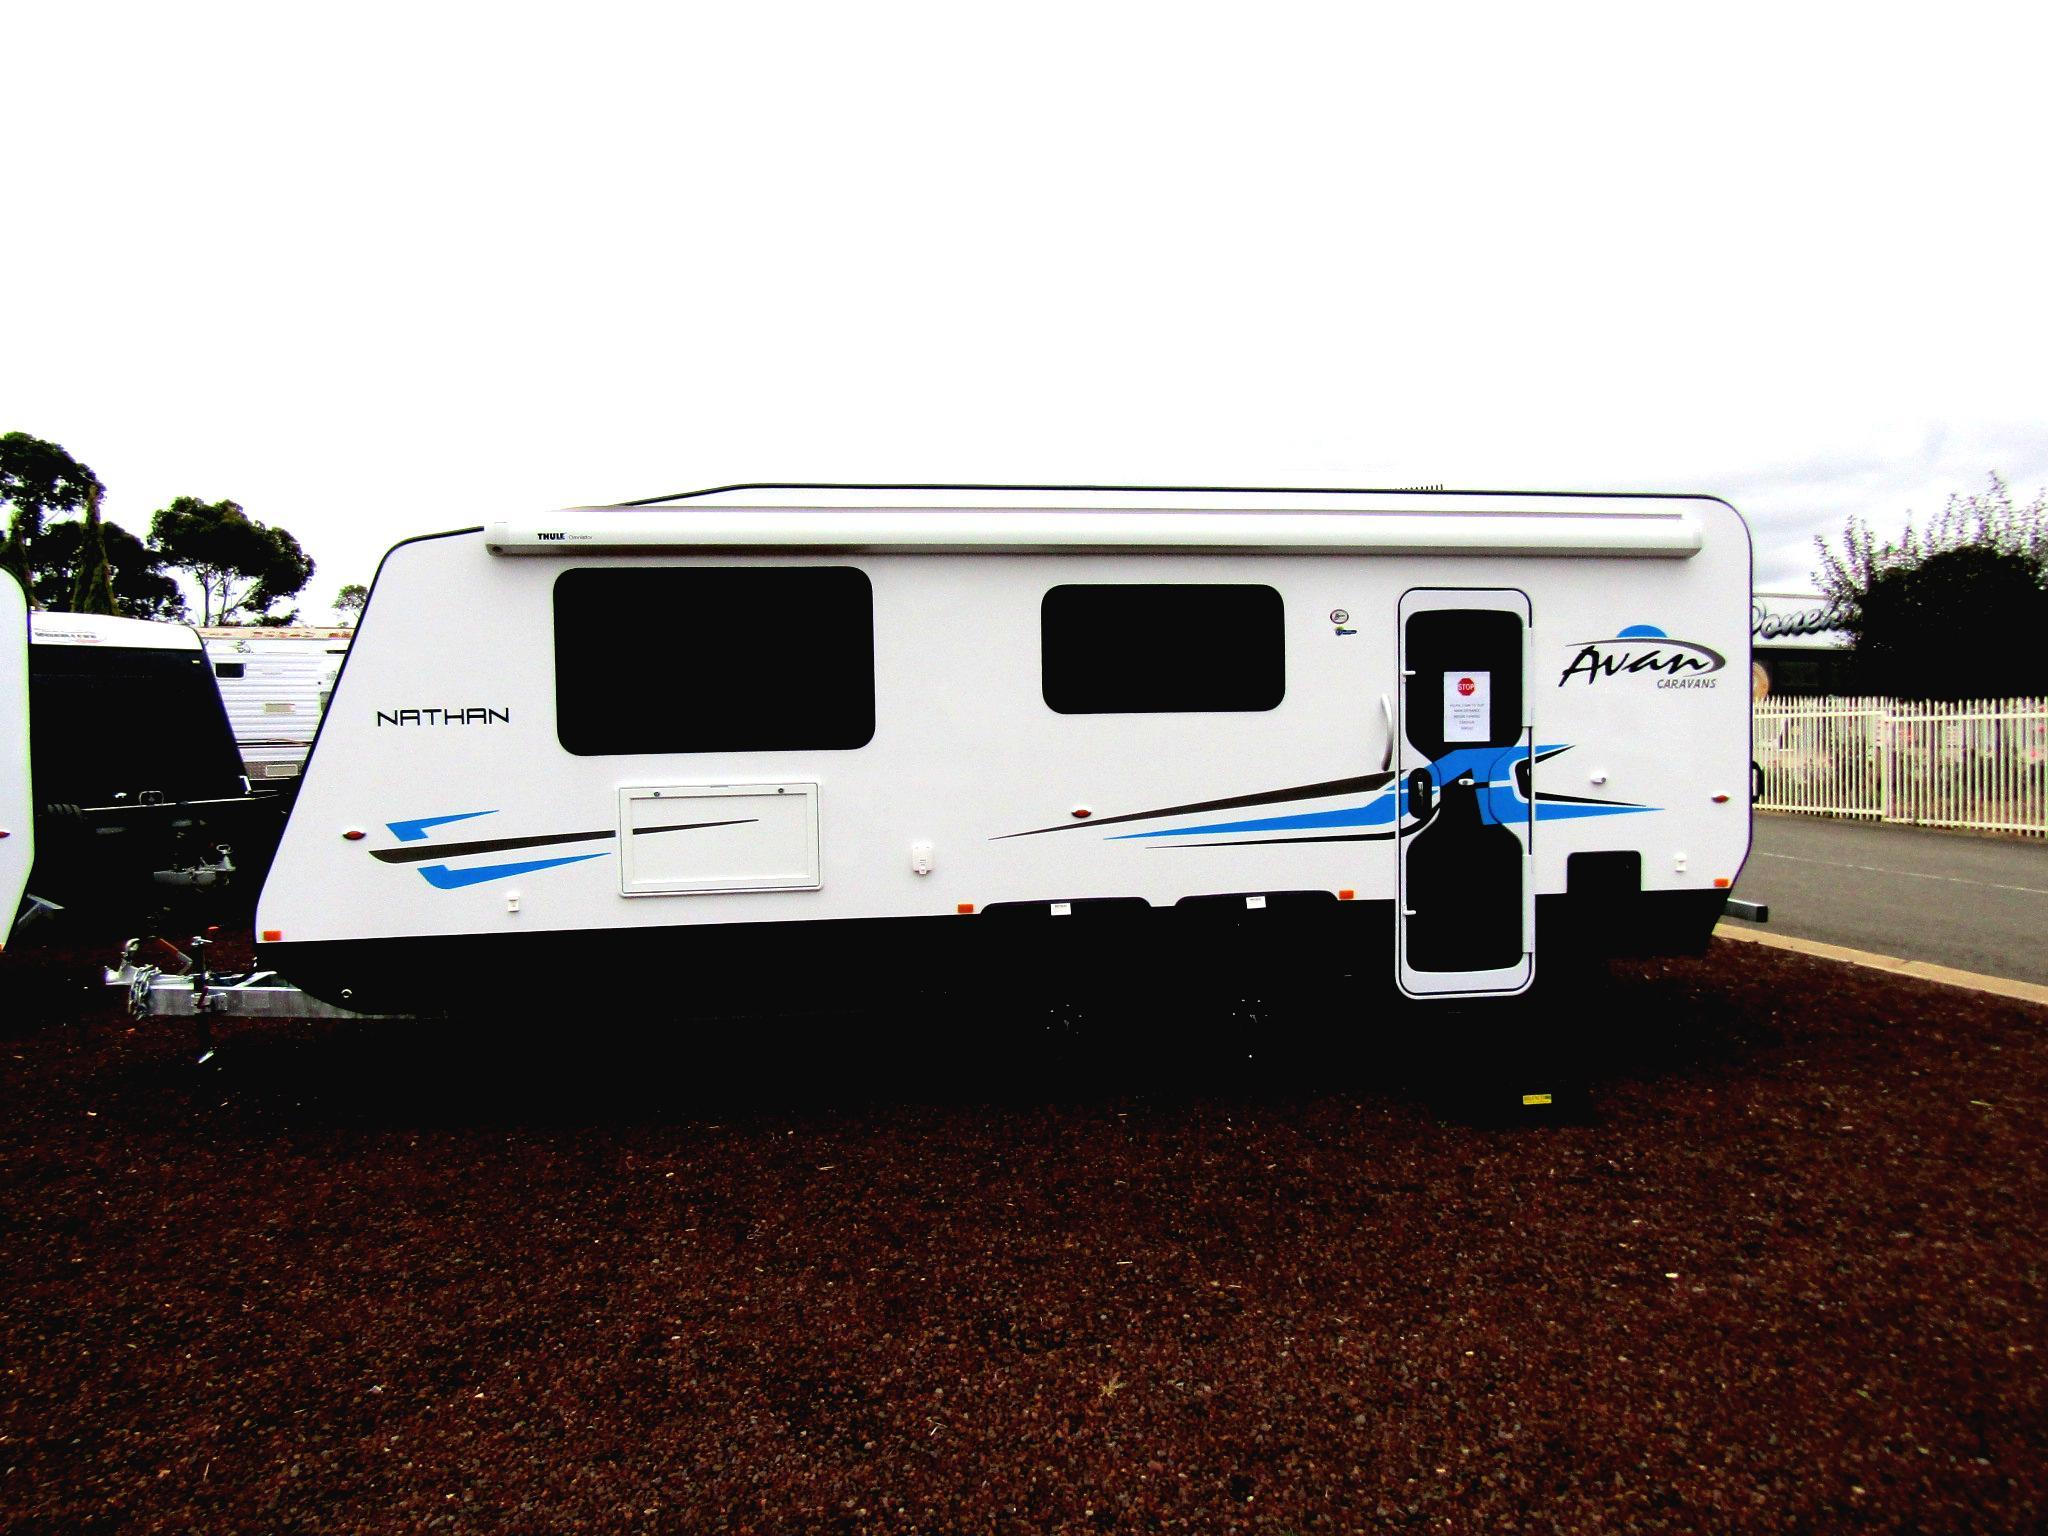 Donehues Leisure Security door Avan Nathan Ensuite Caravan Hamilton 12371 IMG 2464 boost 1